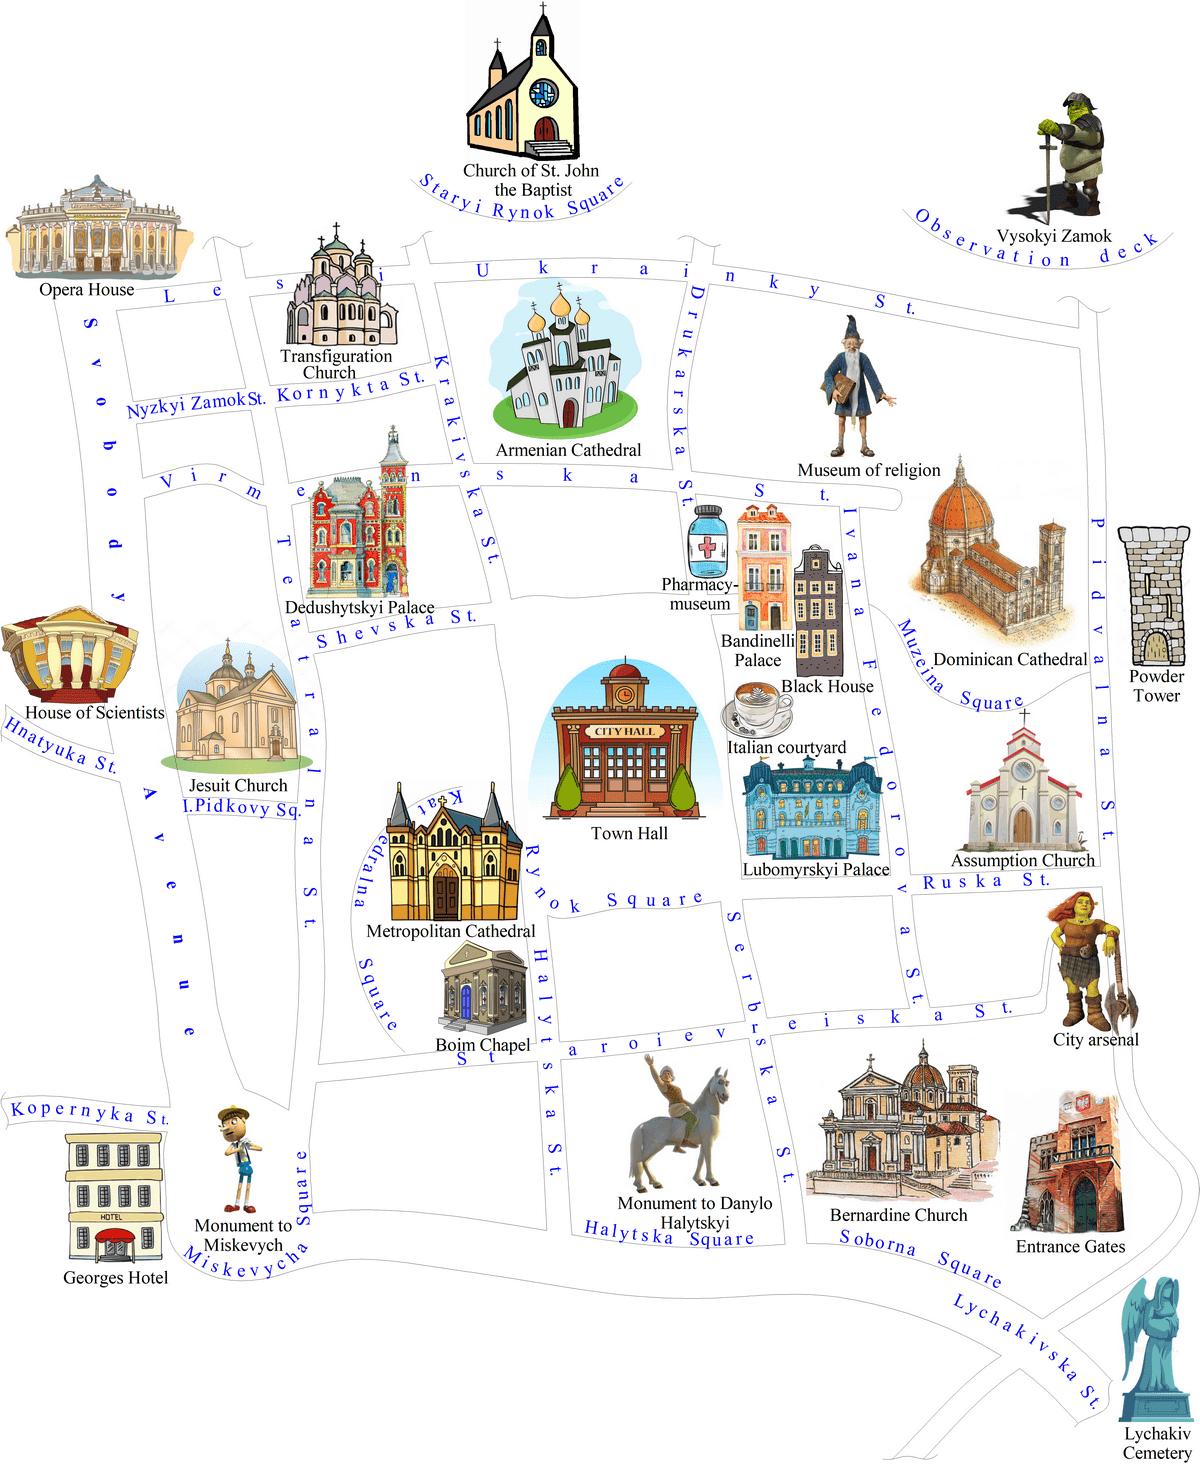 Map of Lviv sights